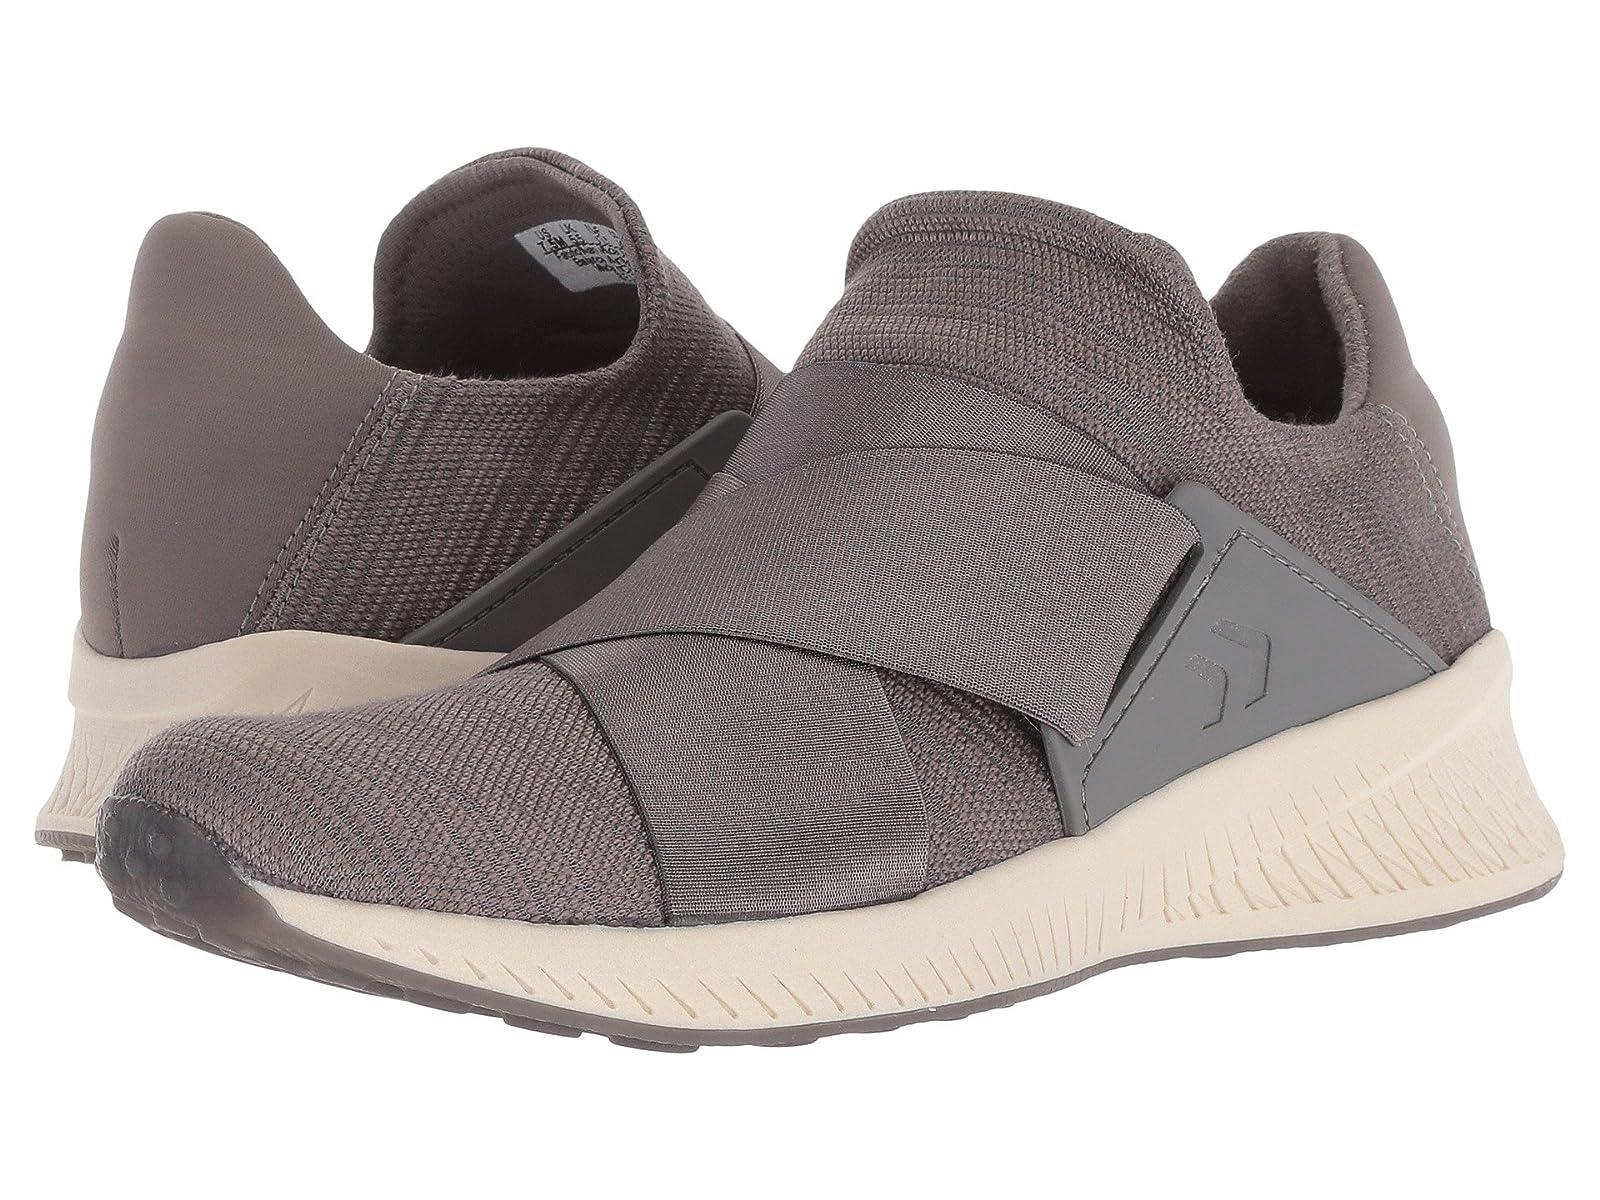 Dr. Scholl's Rest - Original CollectionAtmospheric grades have affordable shoes